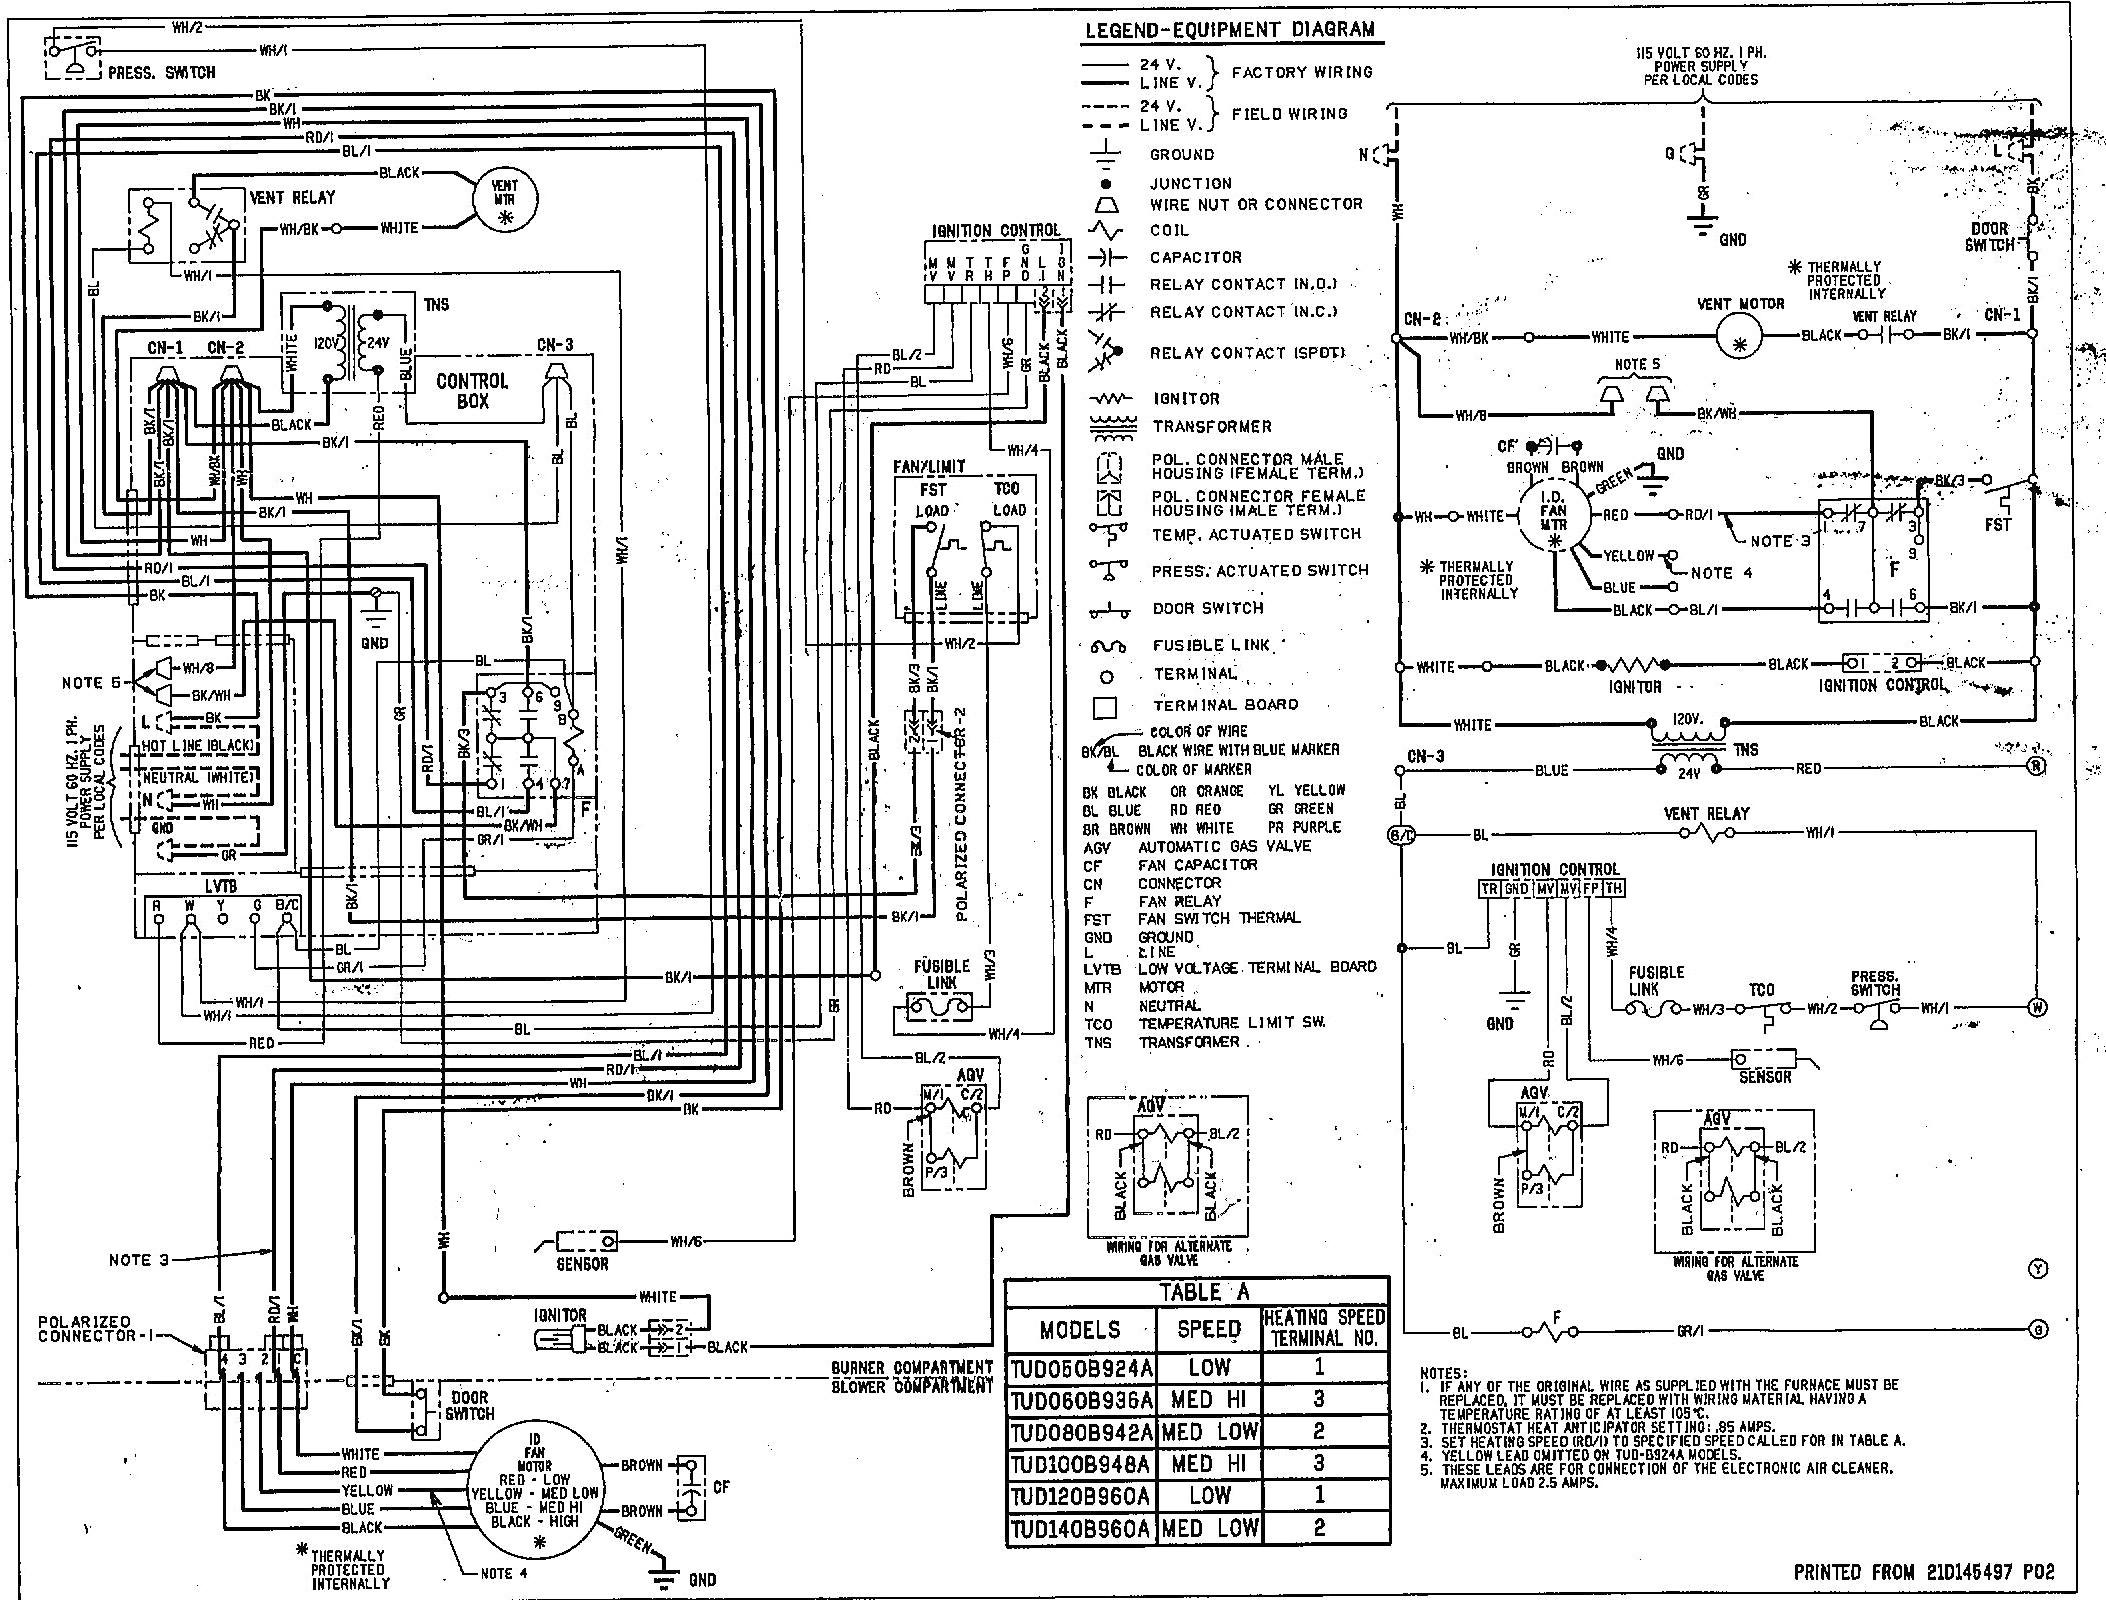 Trane Weathertron thermostat Wiring Diagram Trane Weathertron thermostat Wiring Diagram Weathertron Of Trane Weathertron thermostat Wiring Diagram